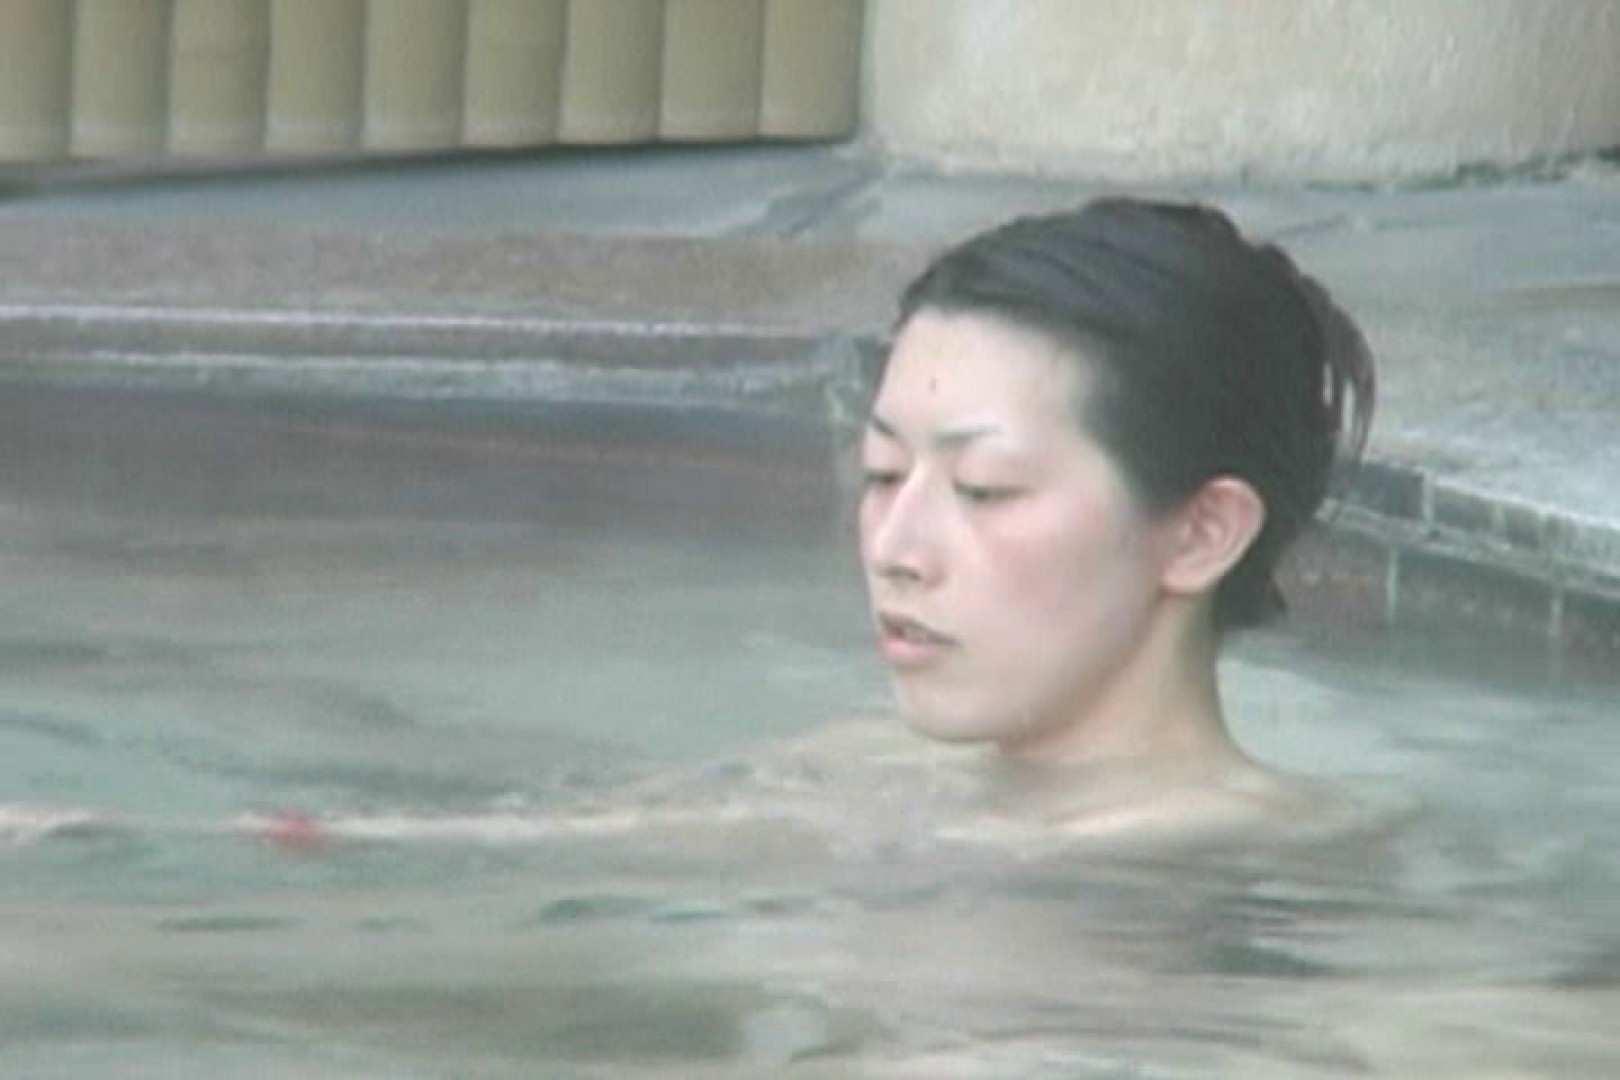 Aquaな露天風呂Vol.589 0   0  74連発 3